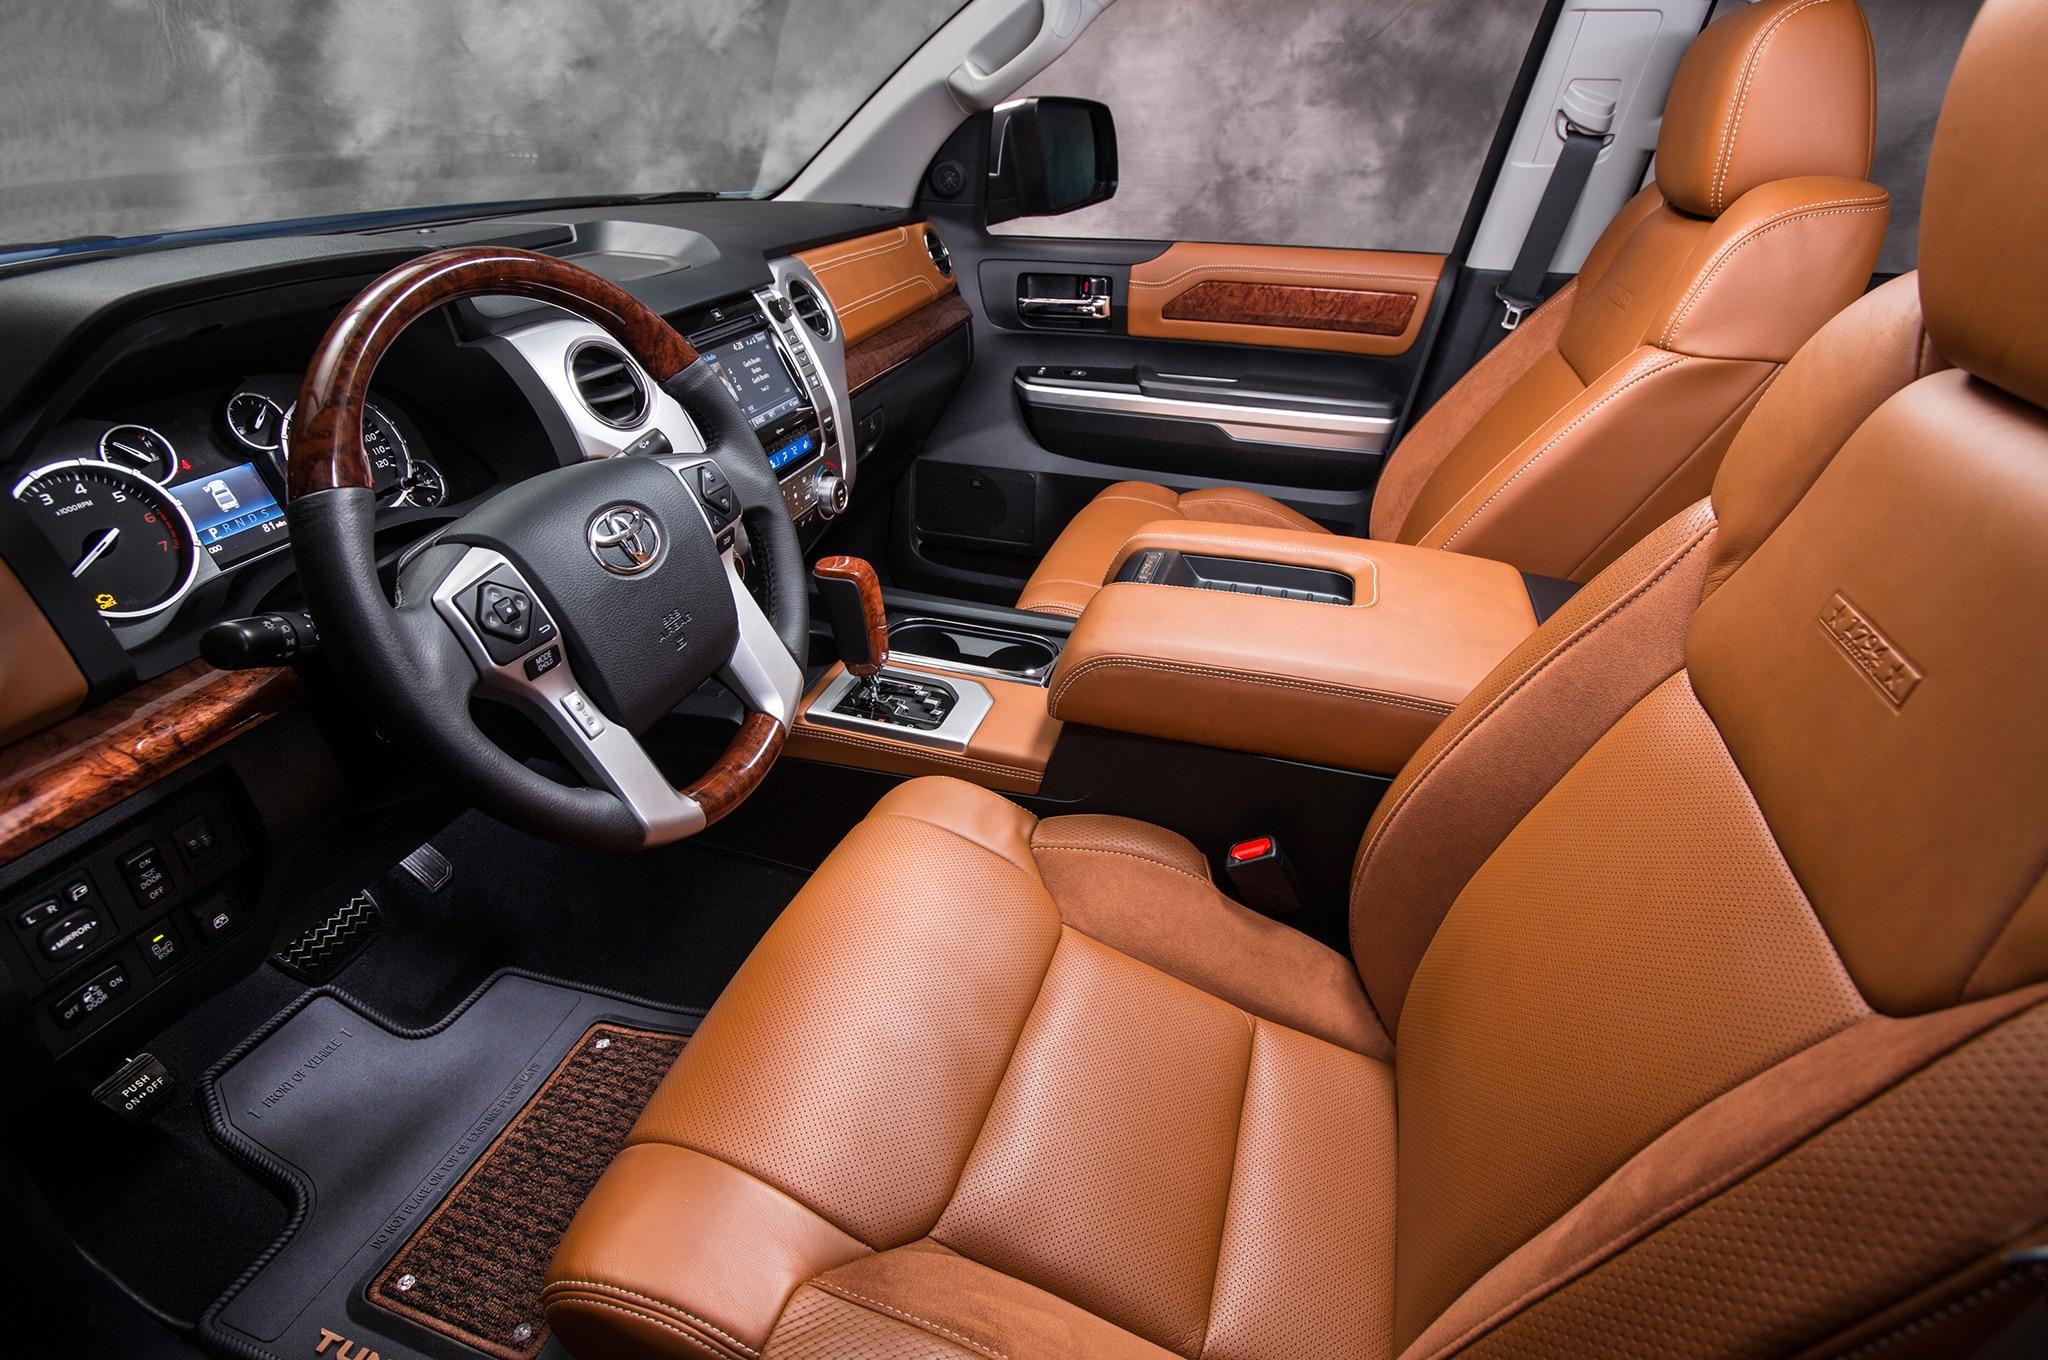 2017 Toyota Tundra 1794 front interior seats - Motor Trend en Español